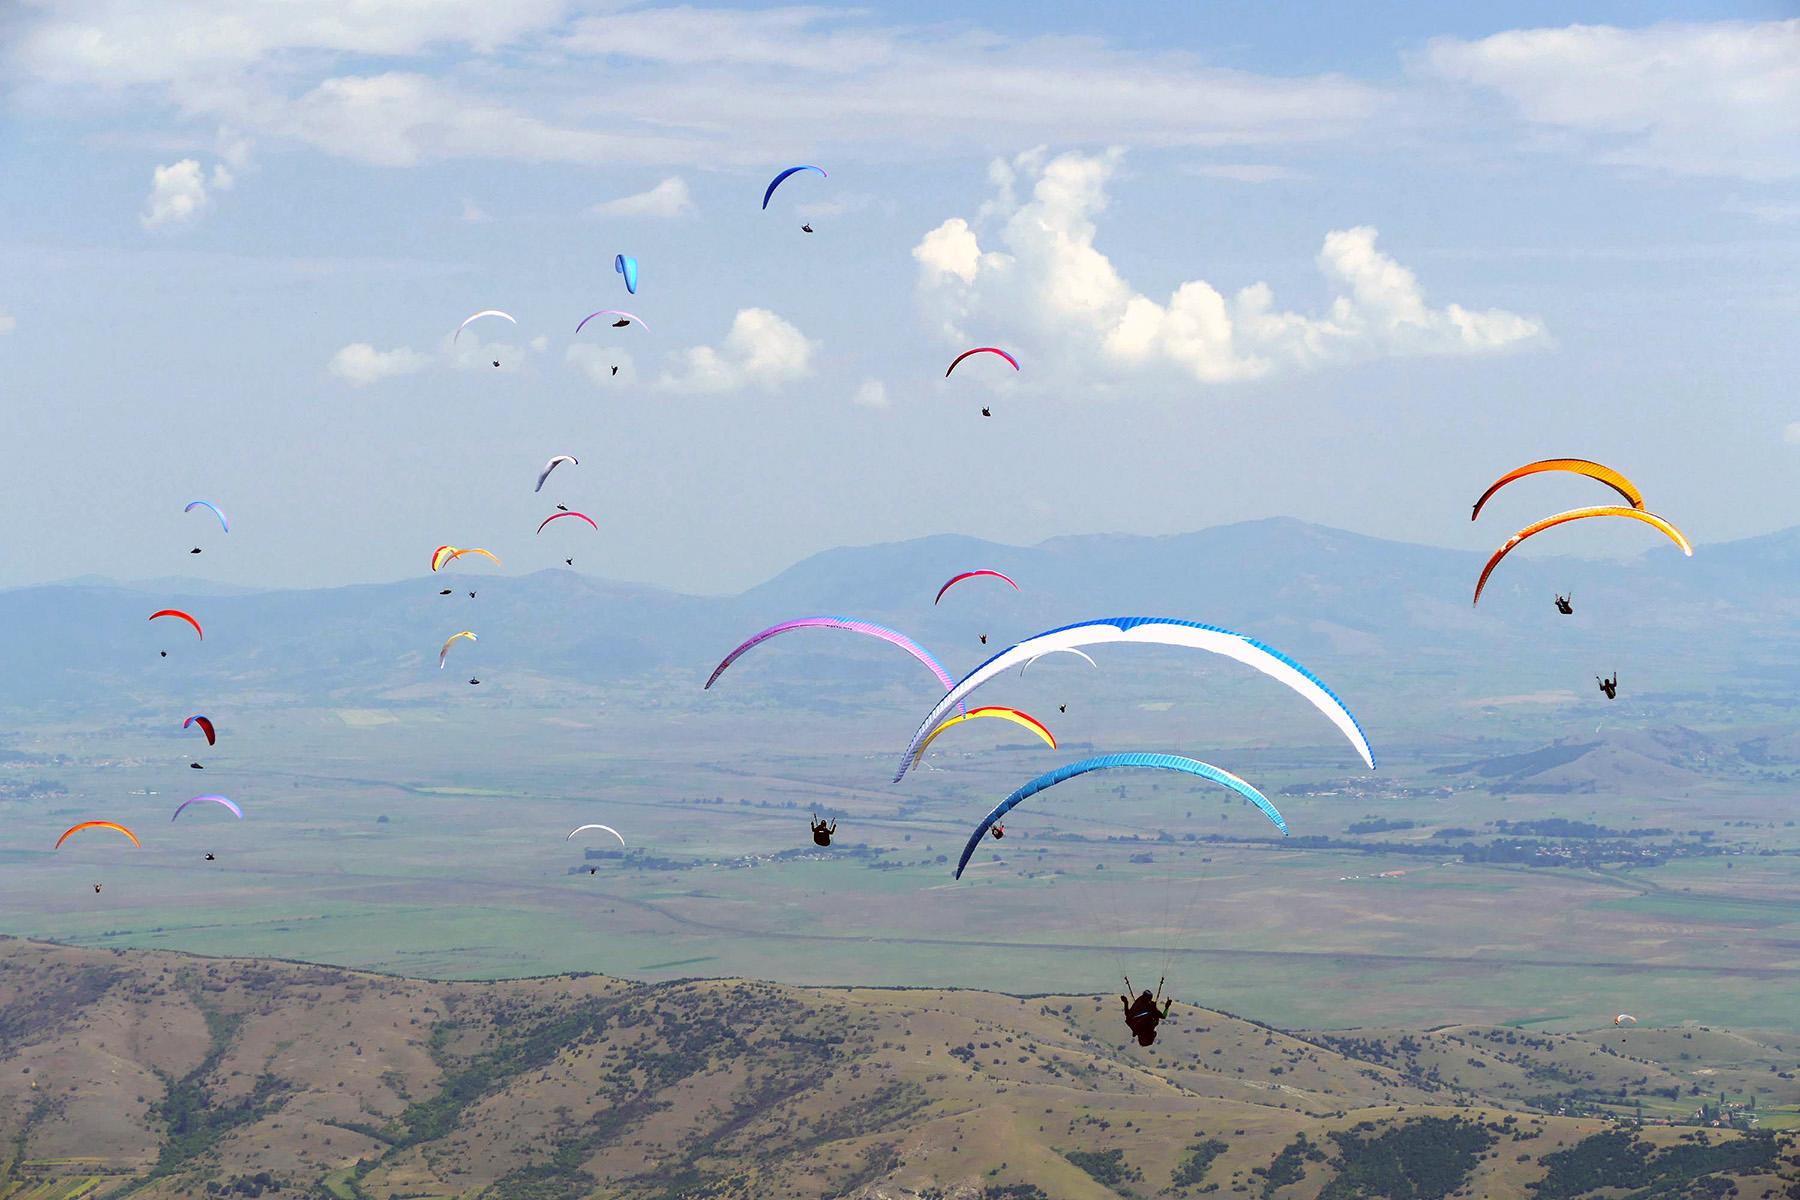 16th FAI World Paragliding Championship in North Macedonia